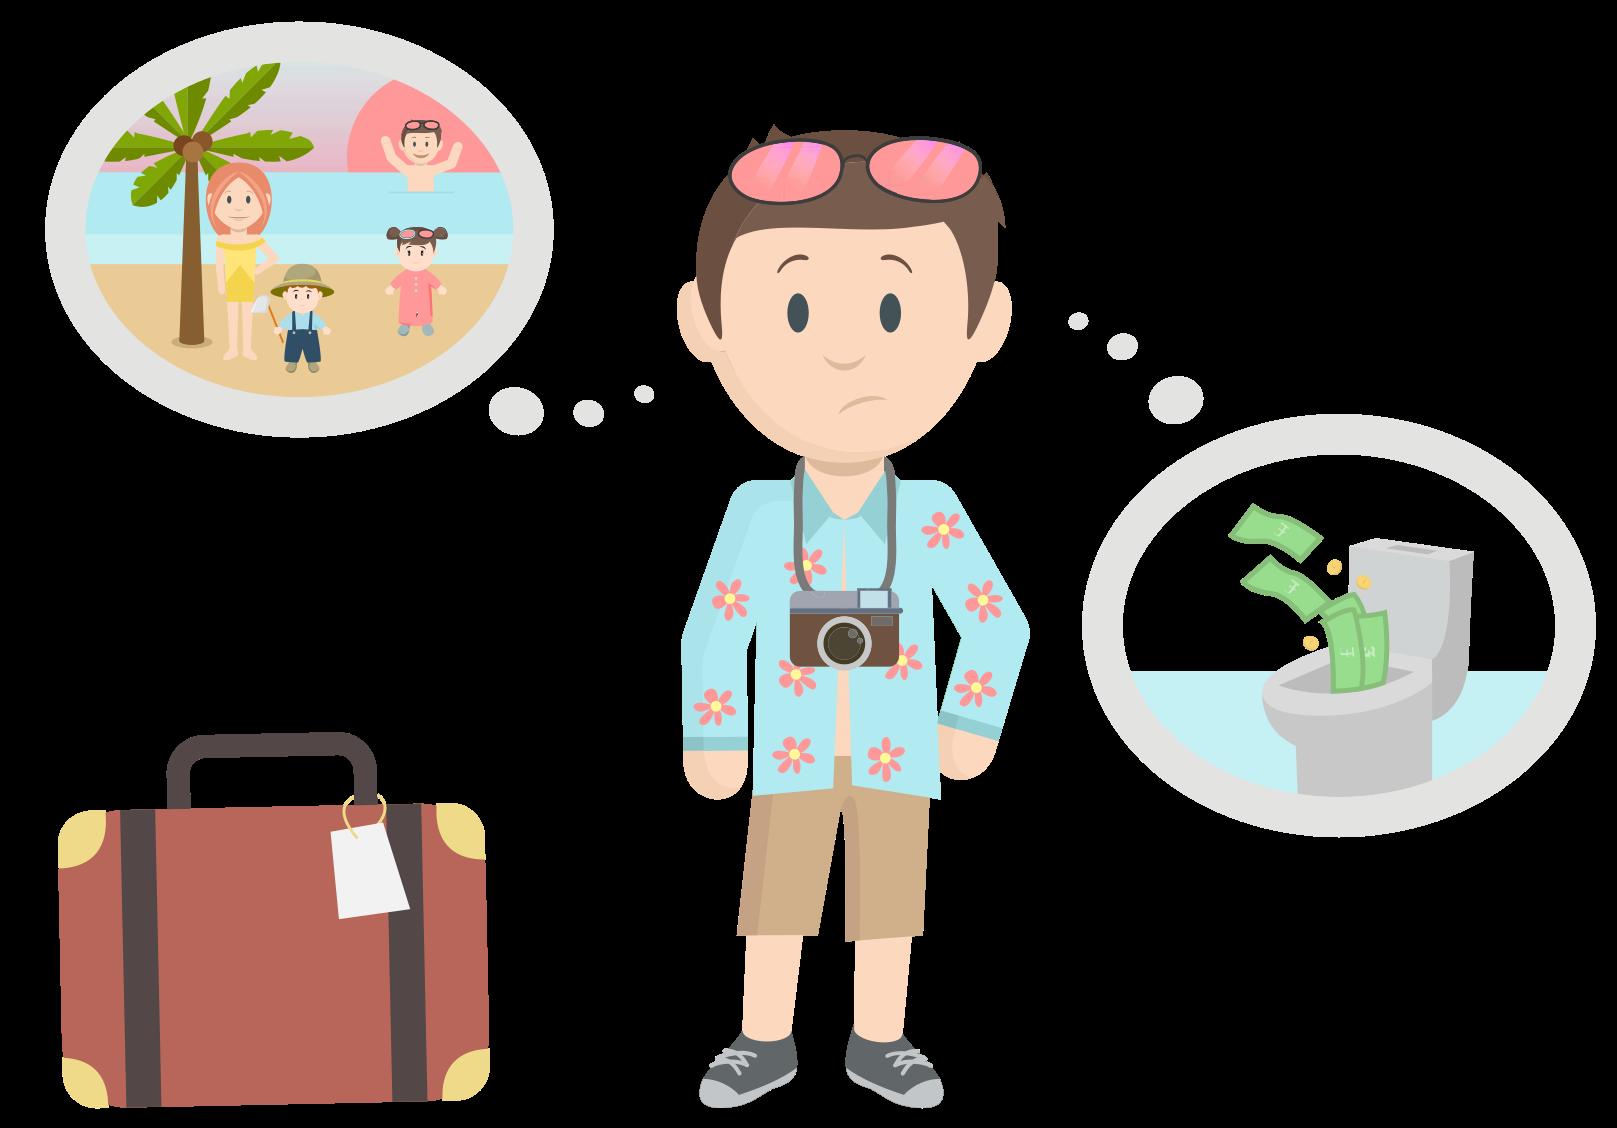 Exercising clipart boy. Travel insurance child holiday